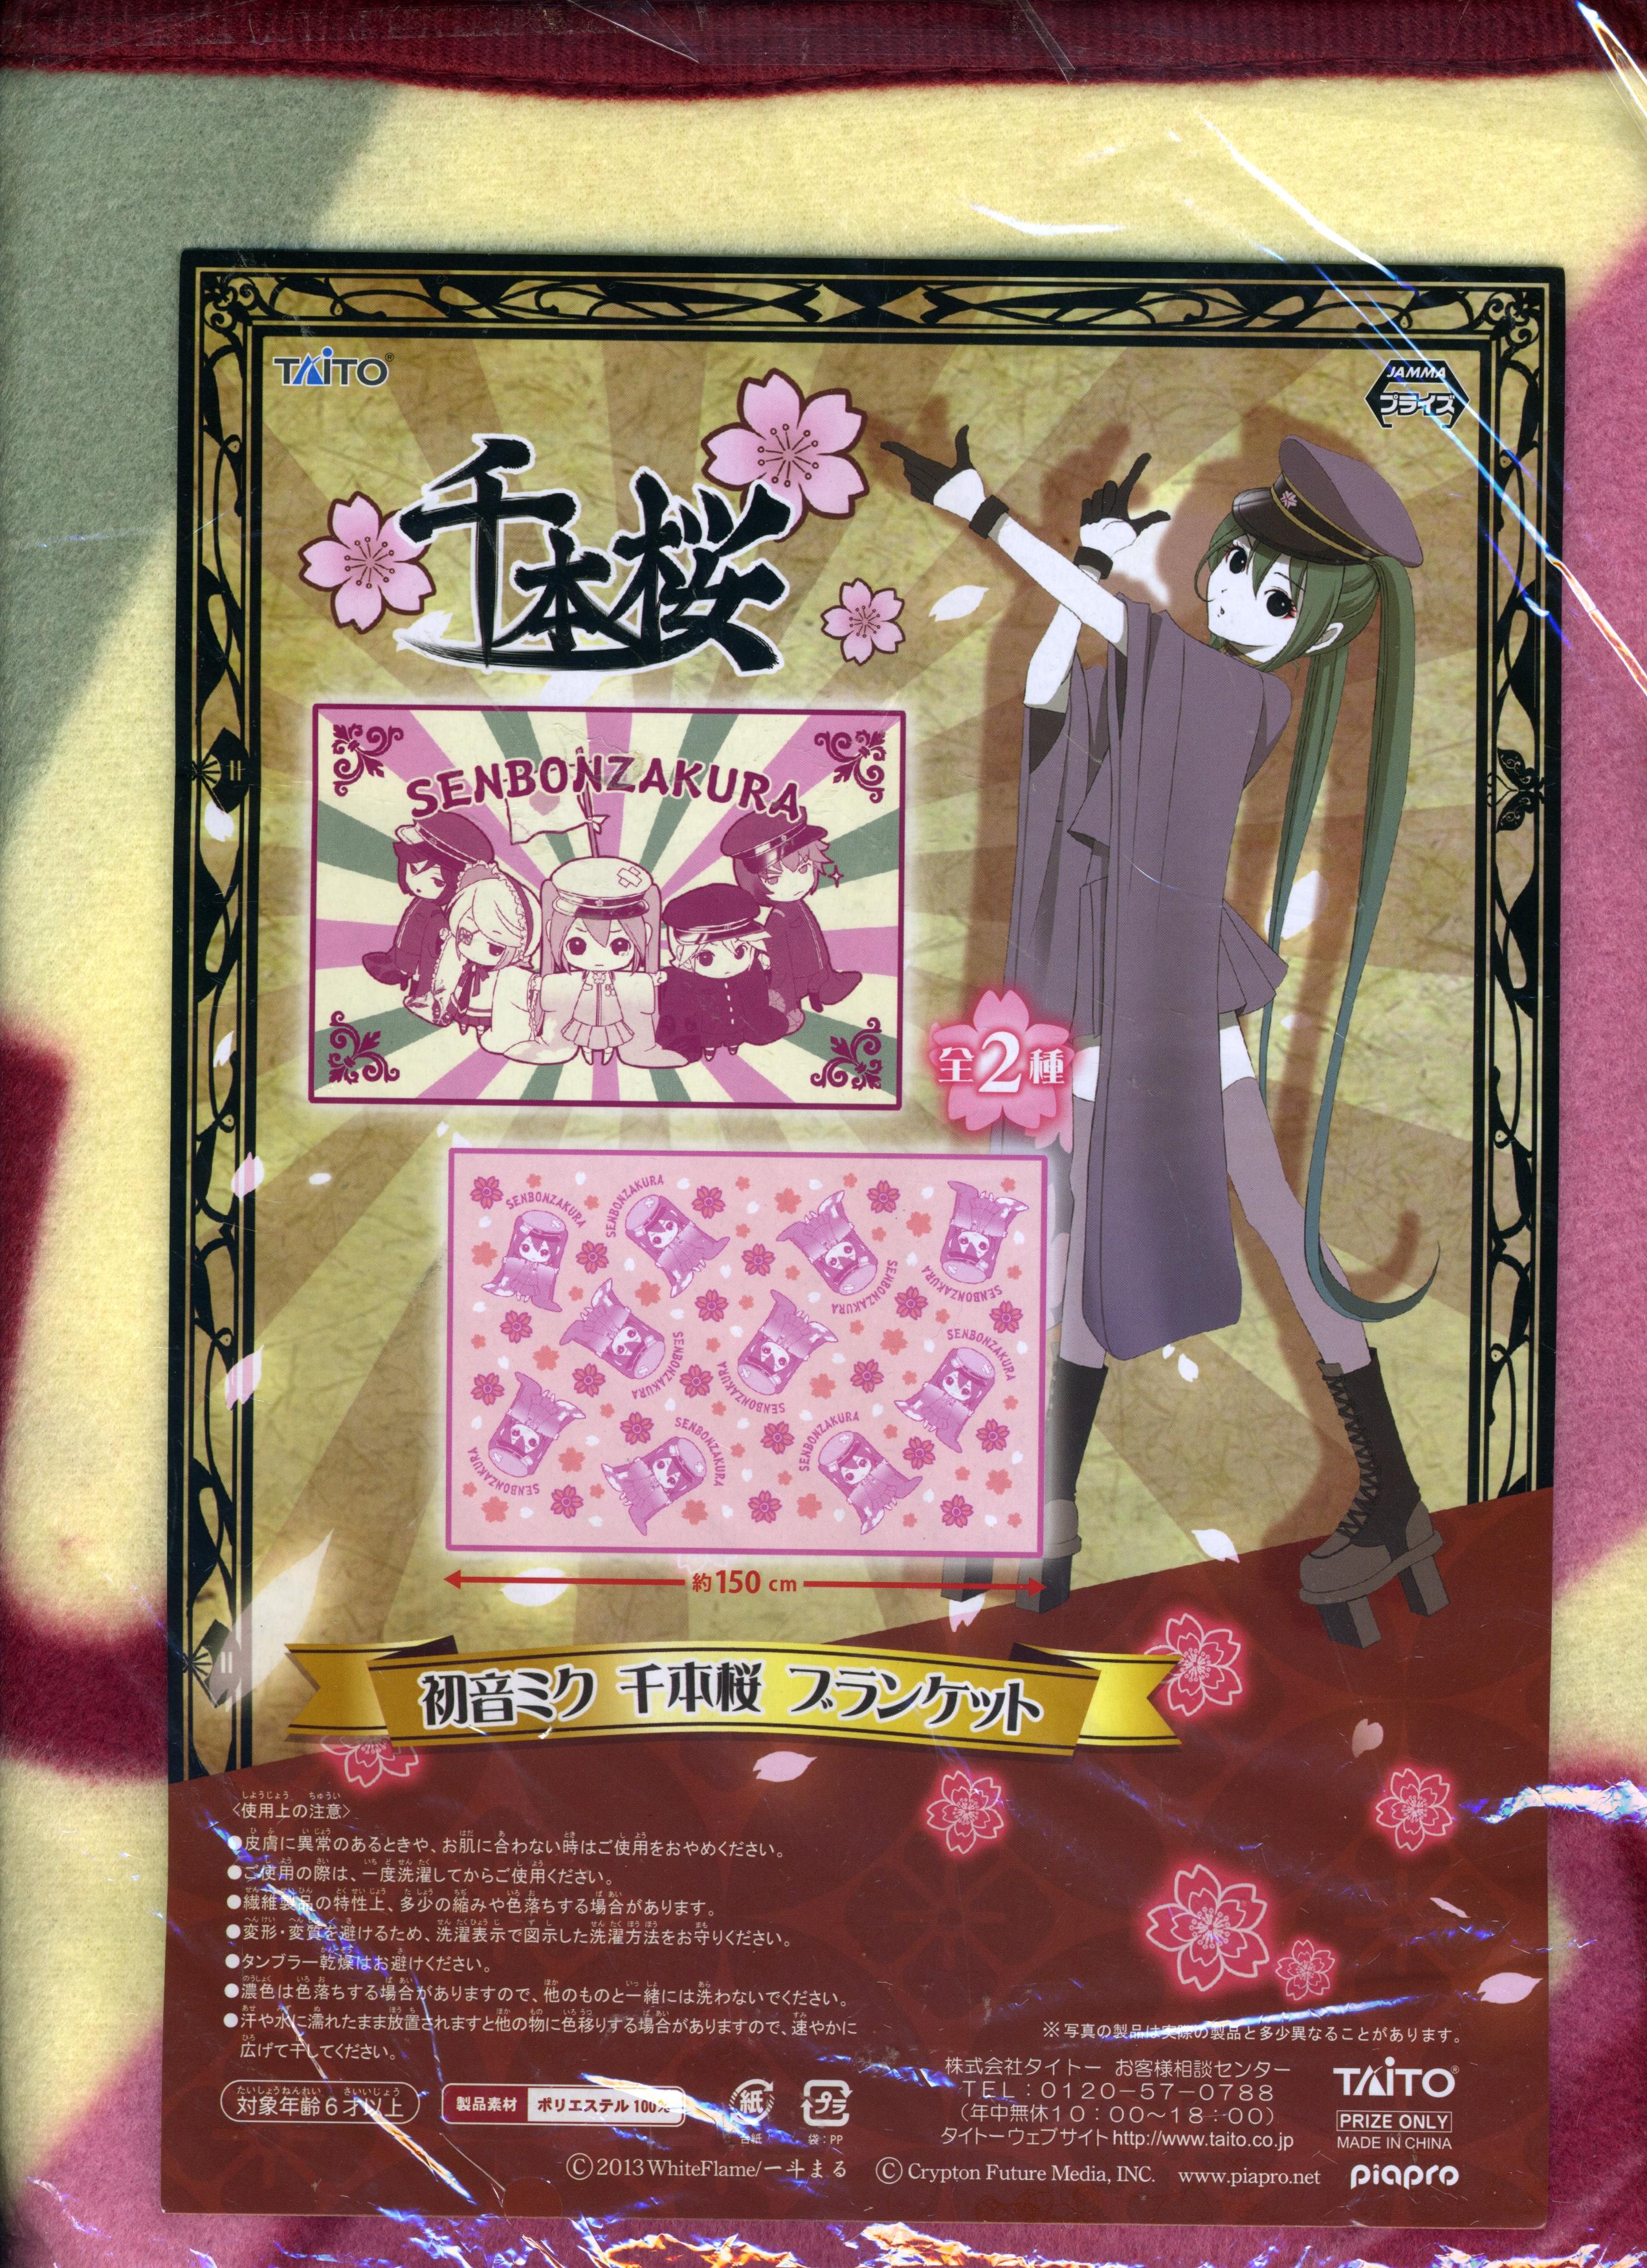 Taito Vocaloid Miku Blanket Prize Hatsune Miku Senbonzakura Blanket 150cm